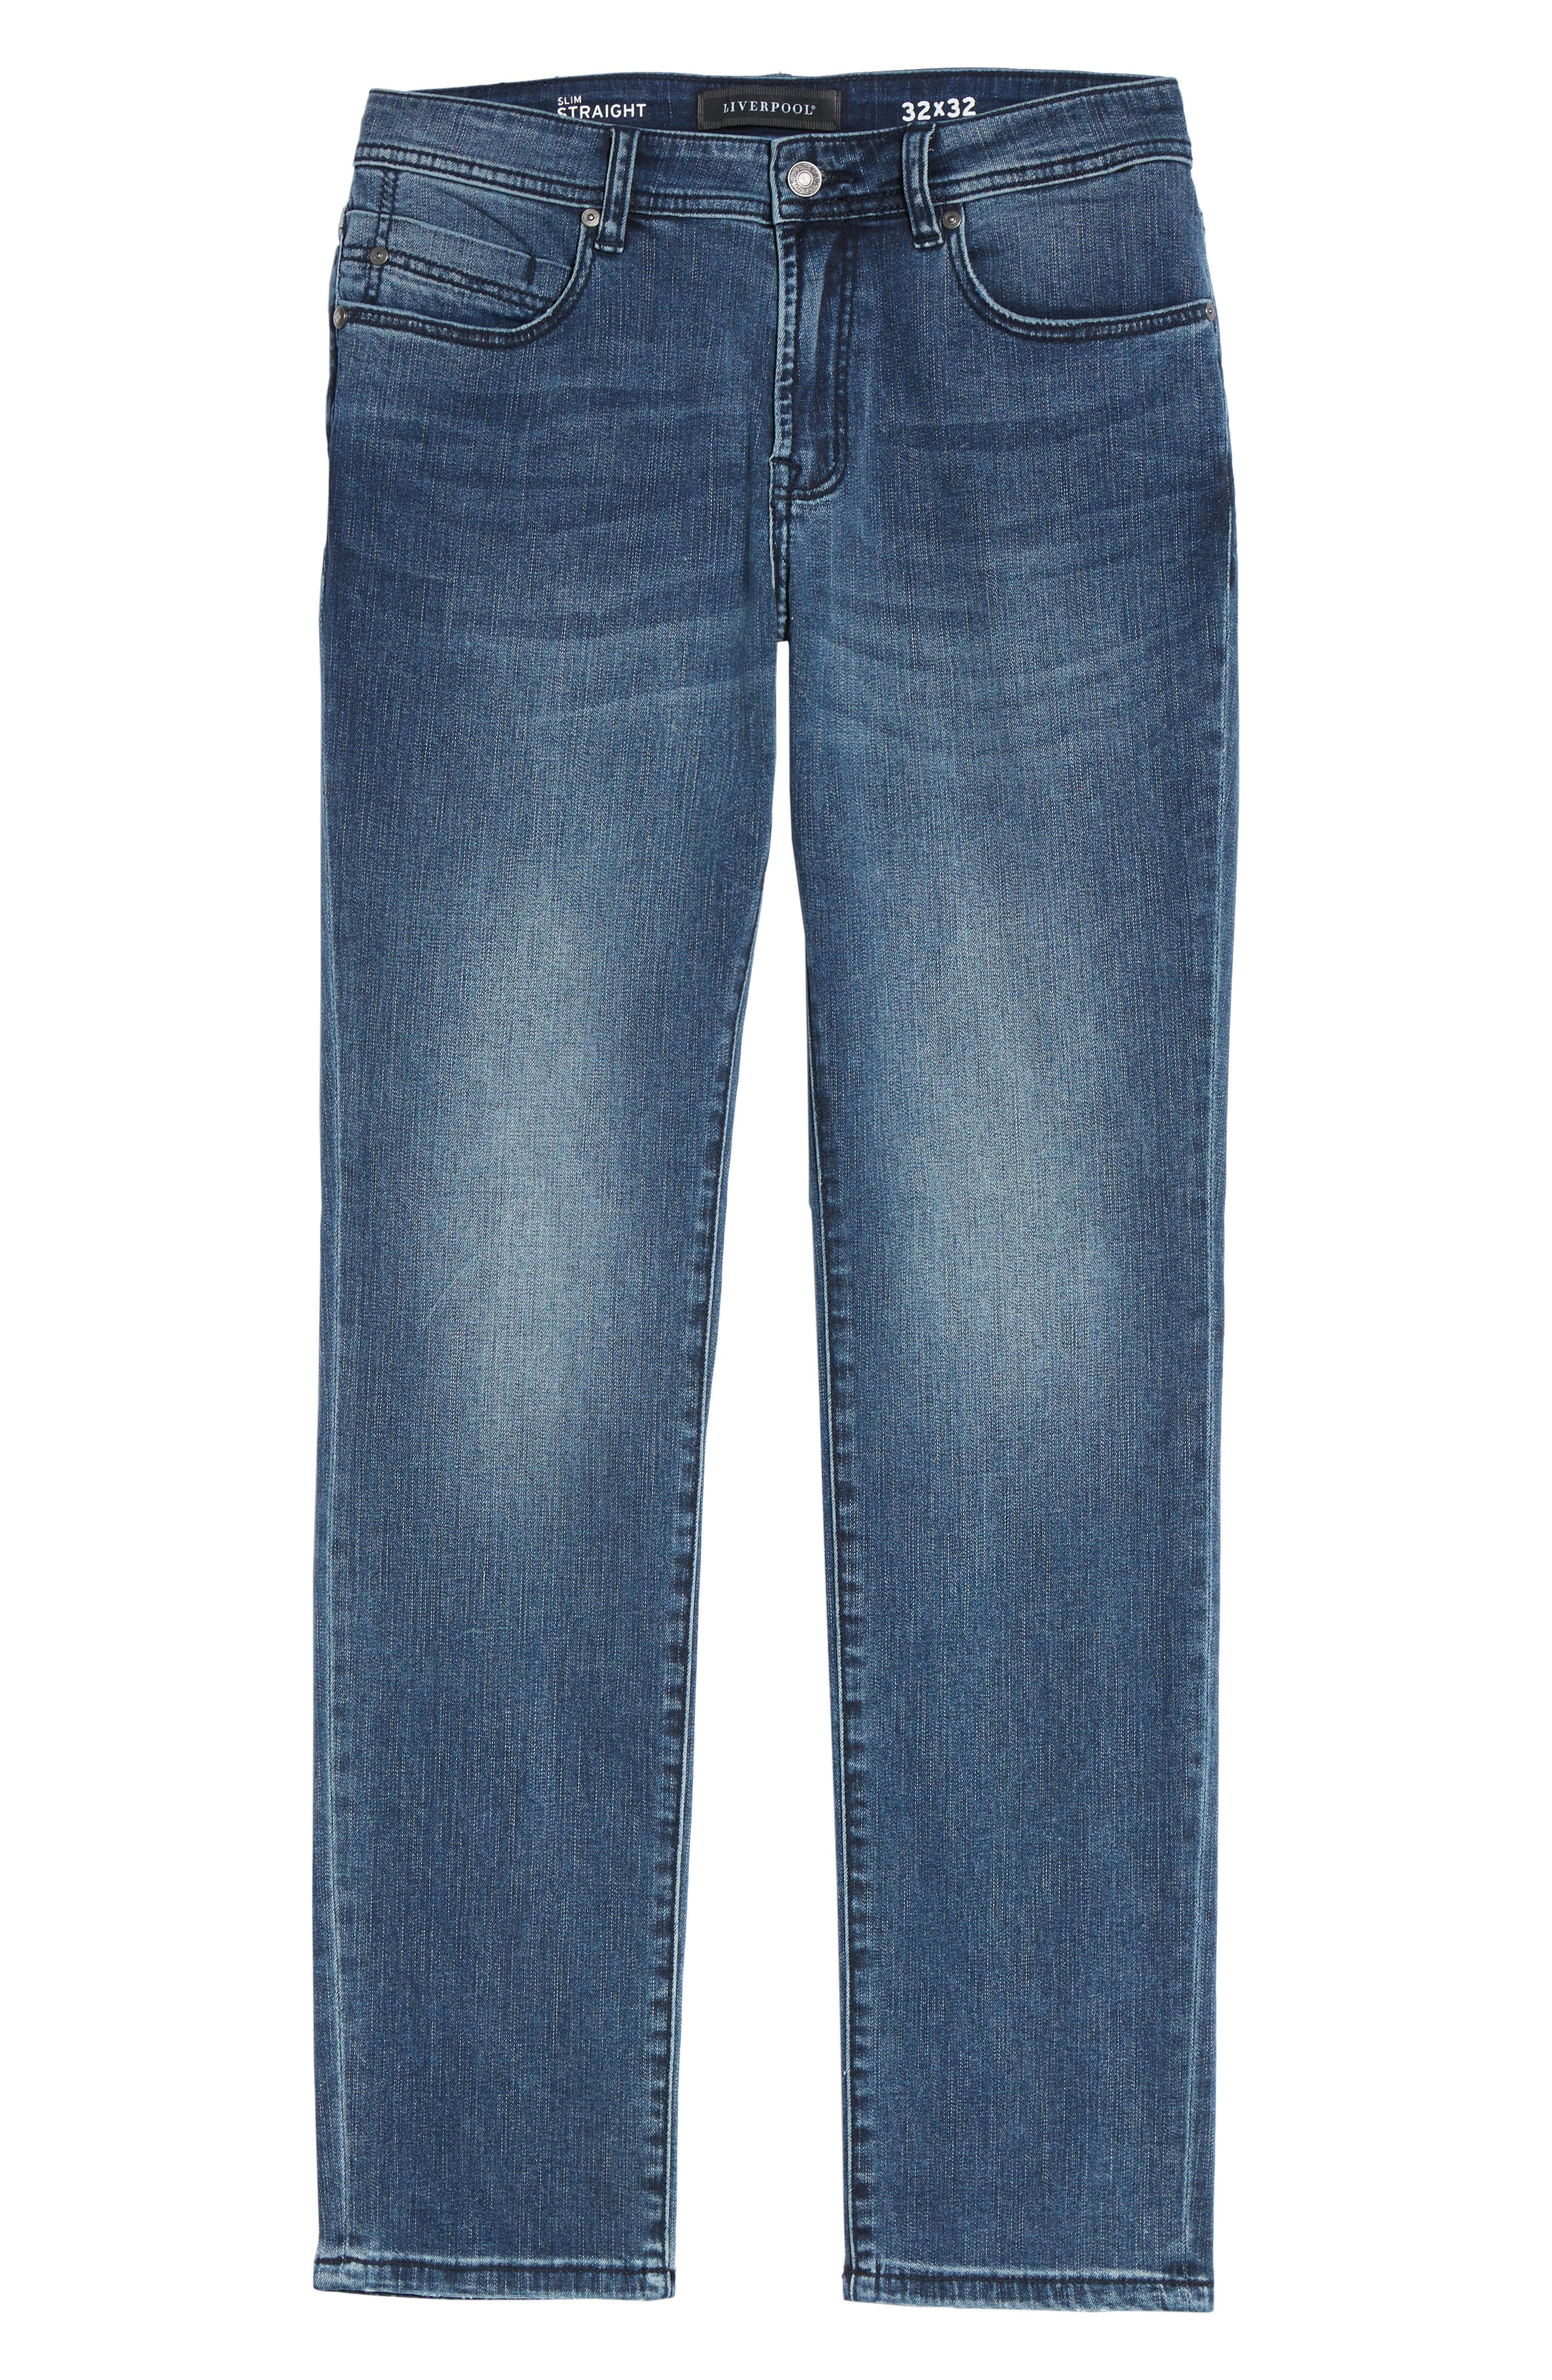 Jeans Co. Slim Straight Leg Jeans,                             Alternate thumbnail 6, color,                             Southaven Mid Blue